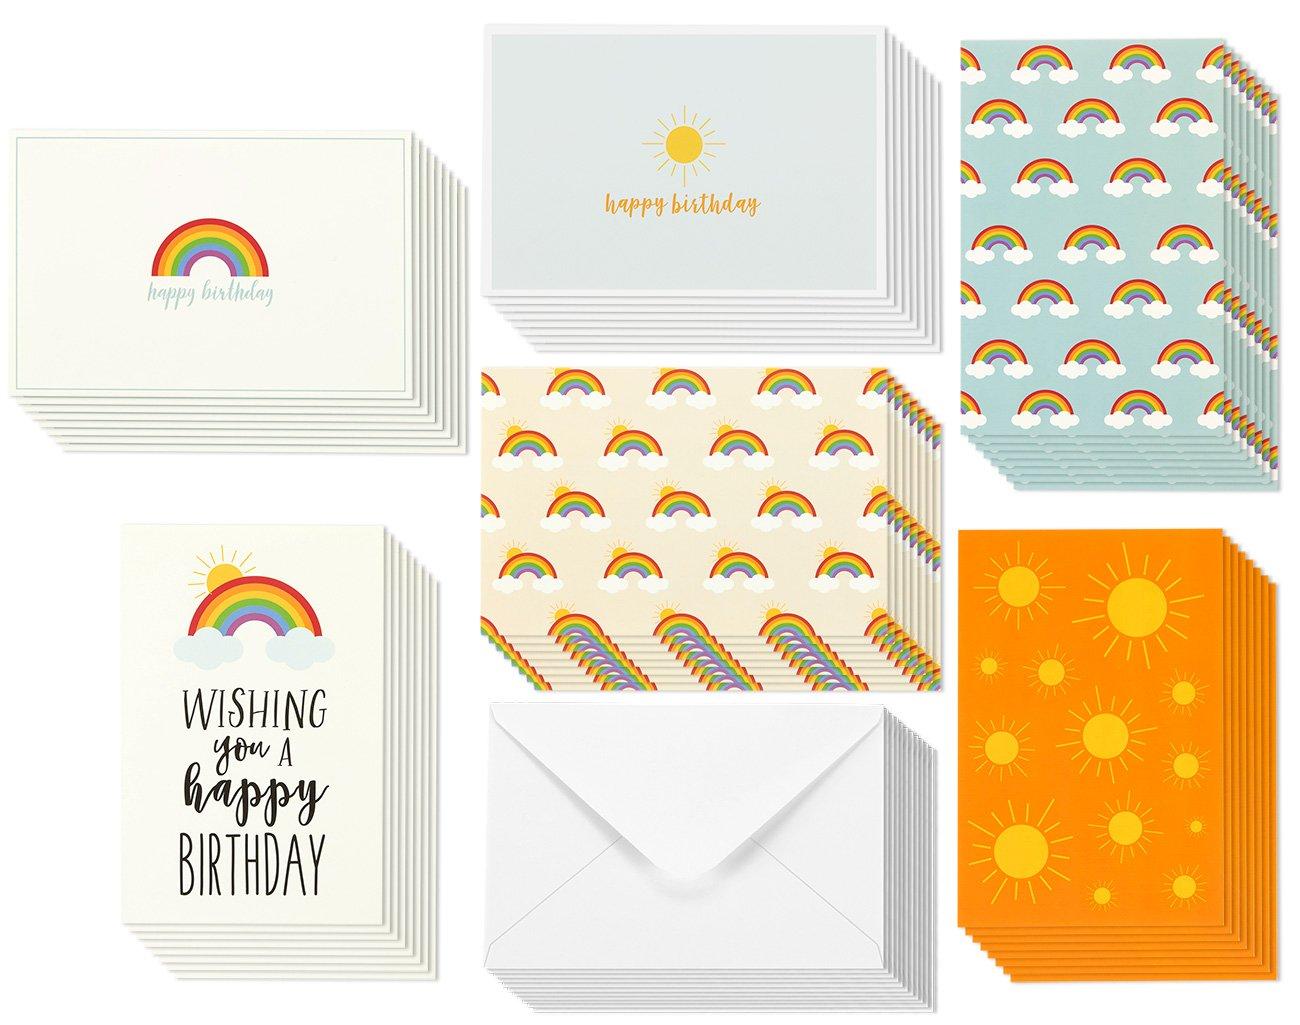 Amazon 48 Assorted Birthday Cards Envelopes 999 Shipped – Assorted Birthday Cards in Bulk